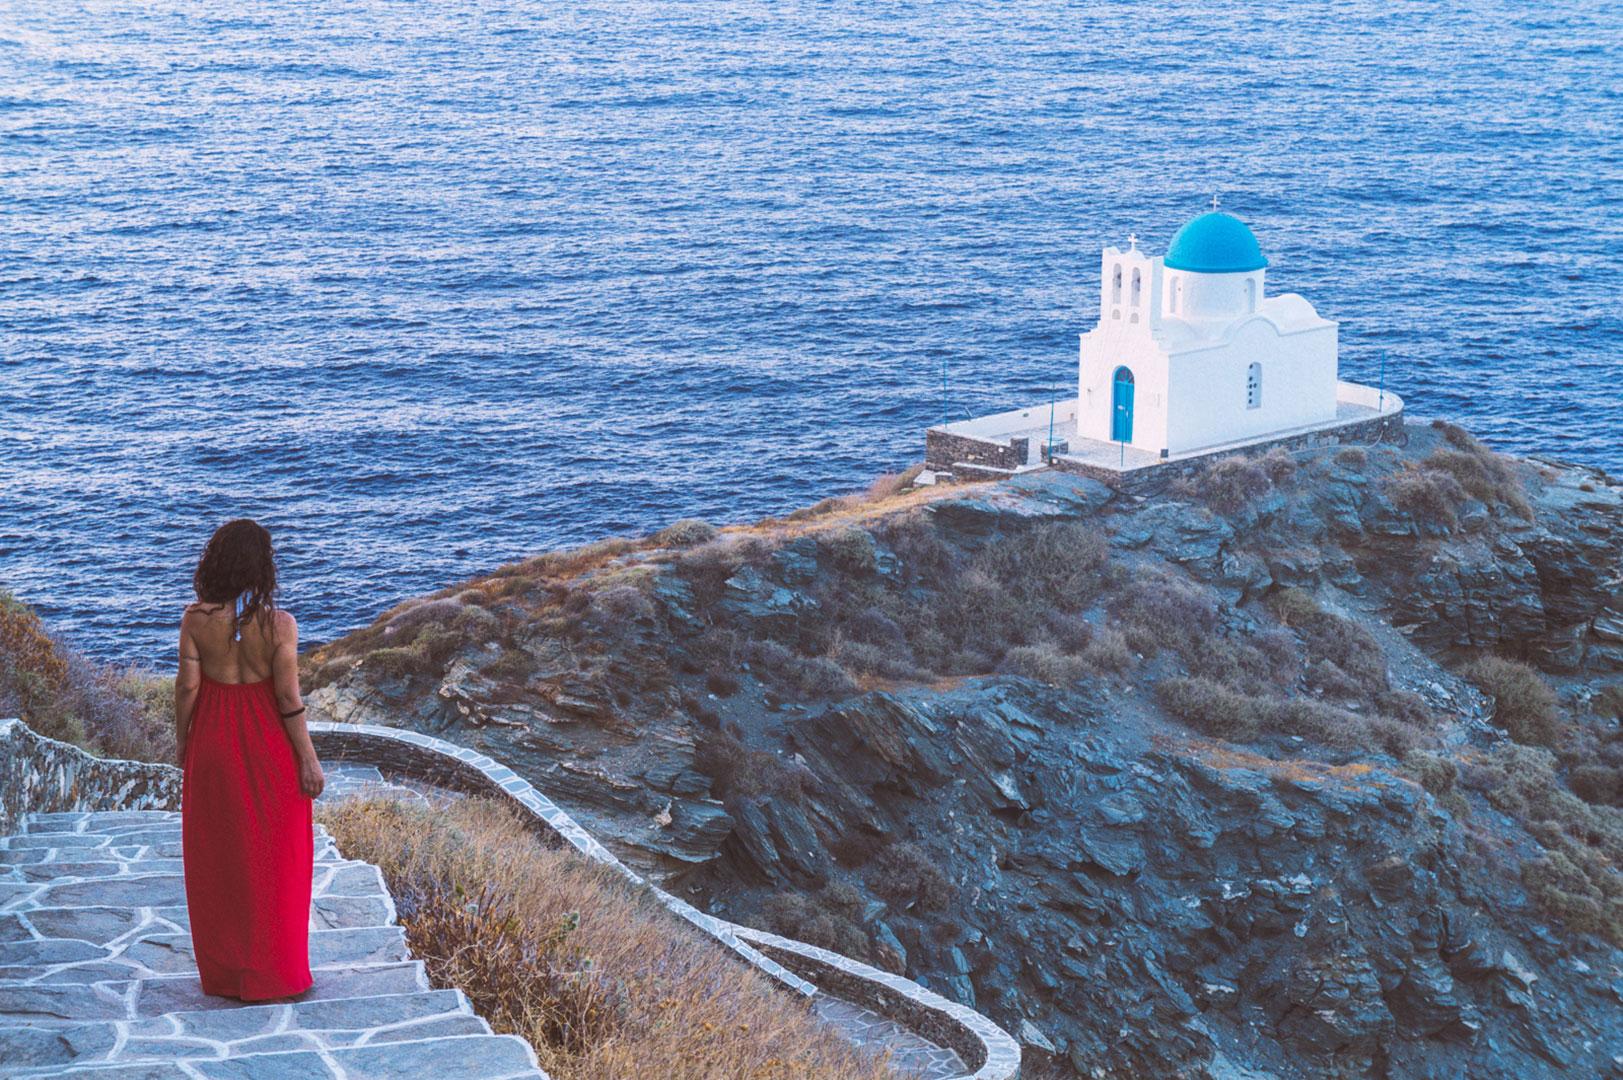 sifnos-greece-la-vie-en-blog-all-rights-reserved-16